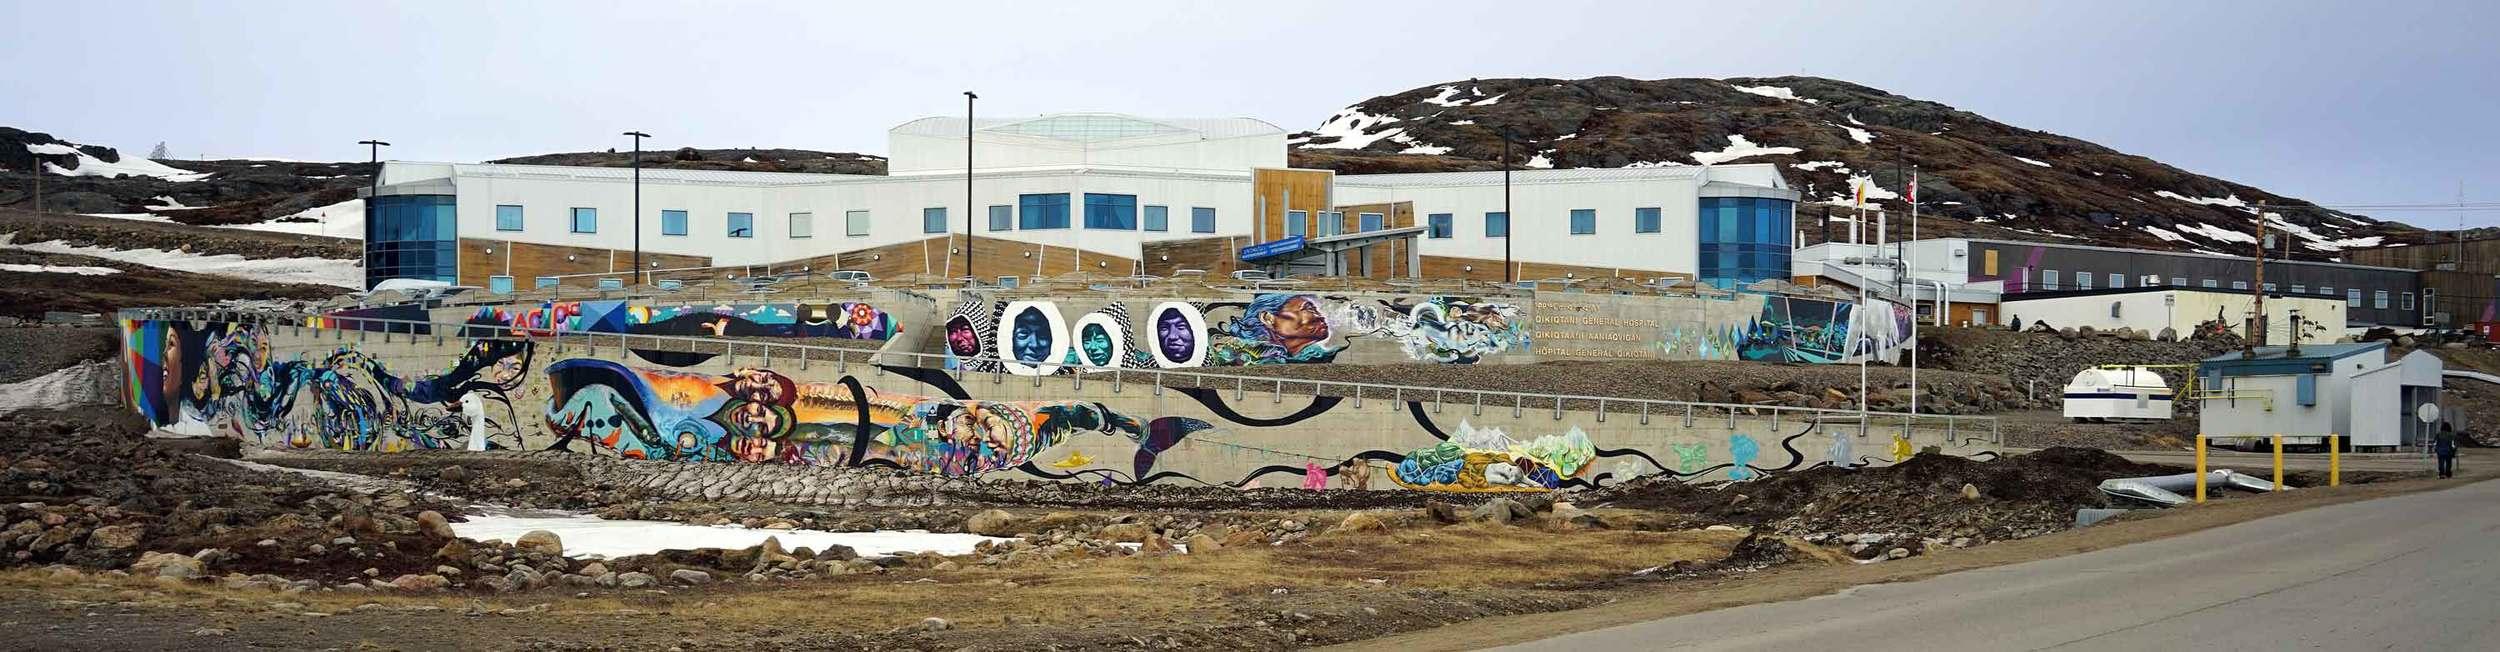 Mural at Qikiqtani General Hospital. Iqaluit. Photo: Christine Montague